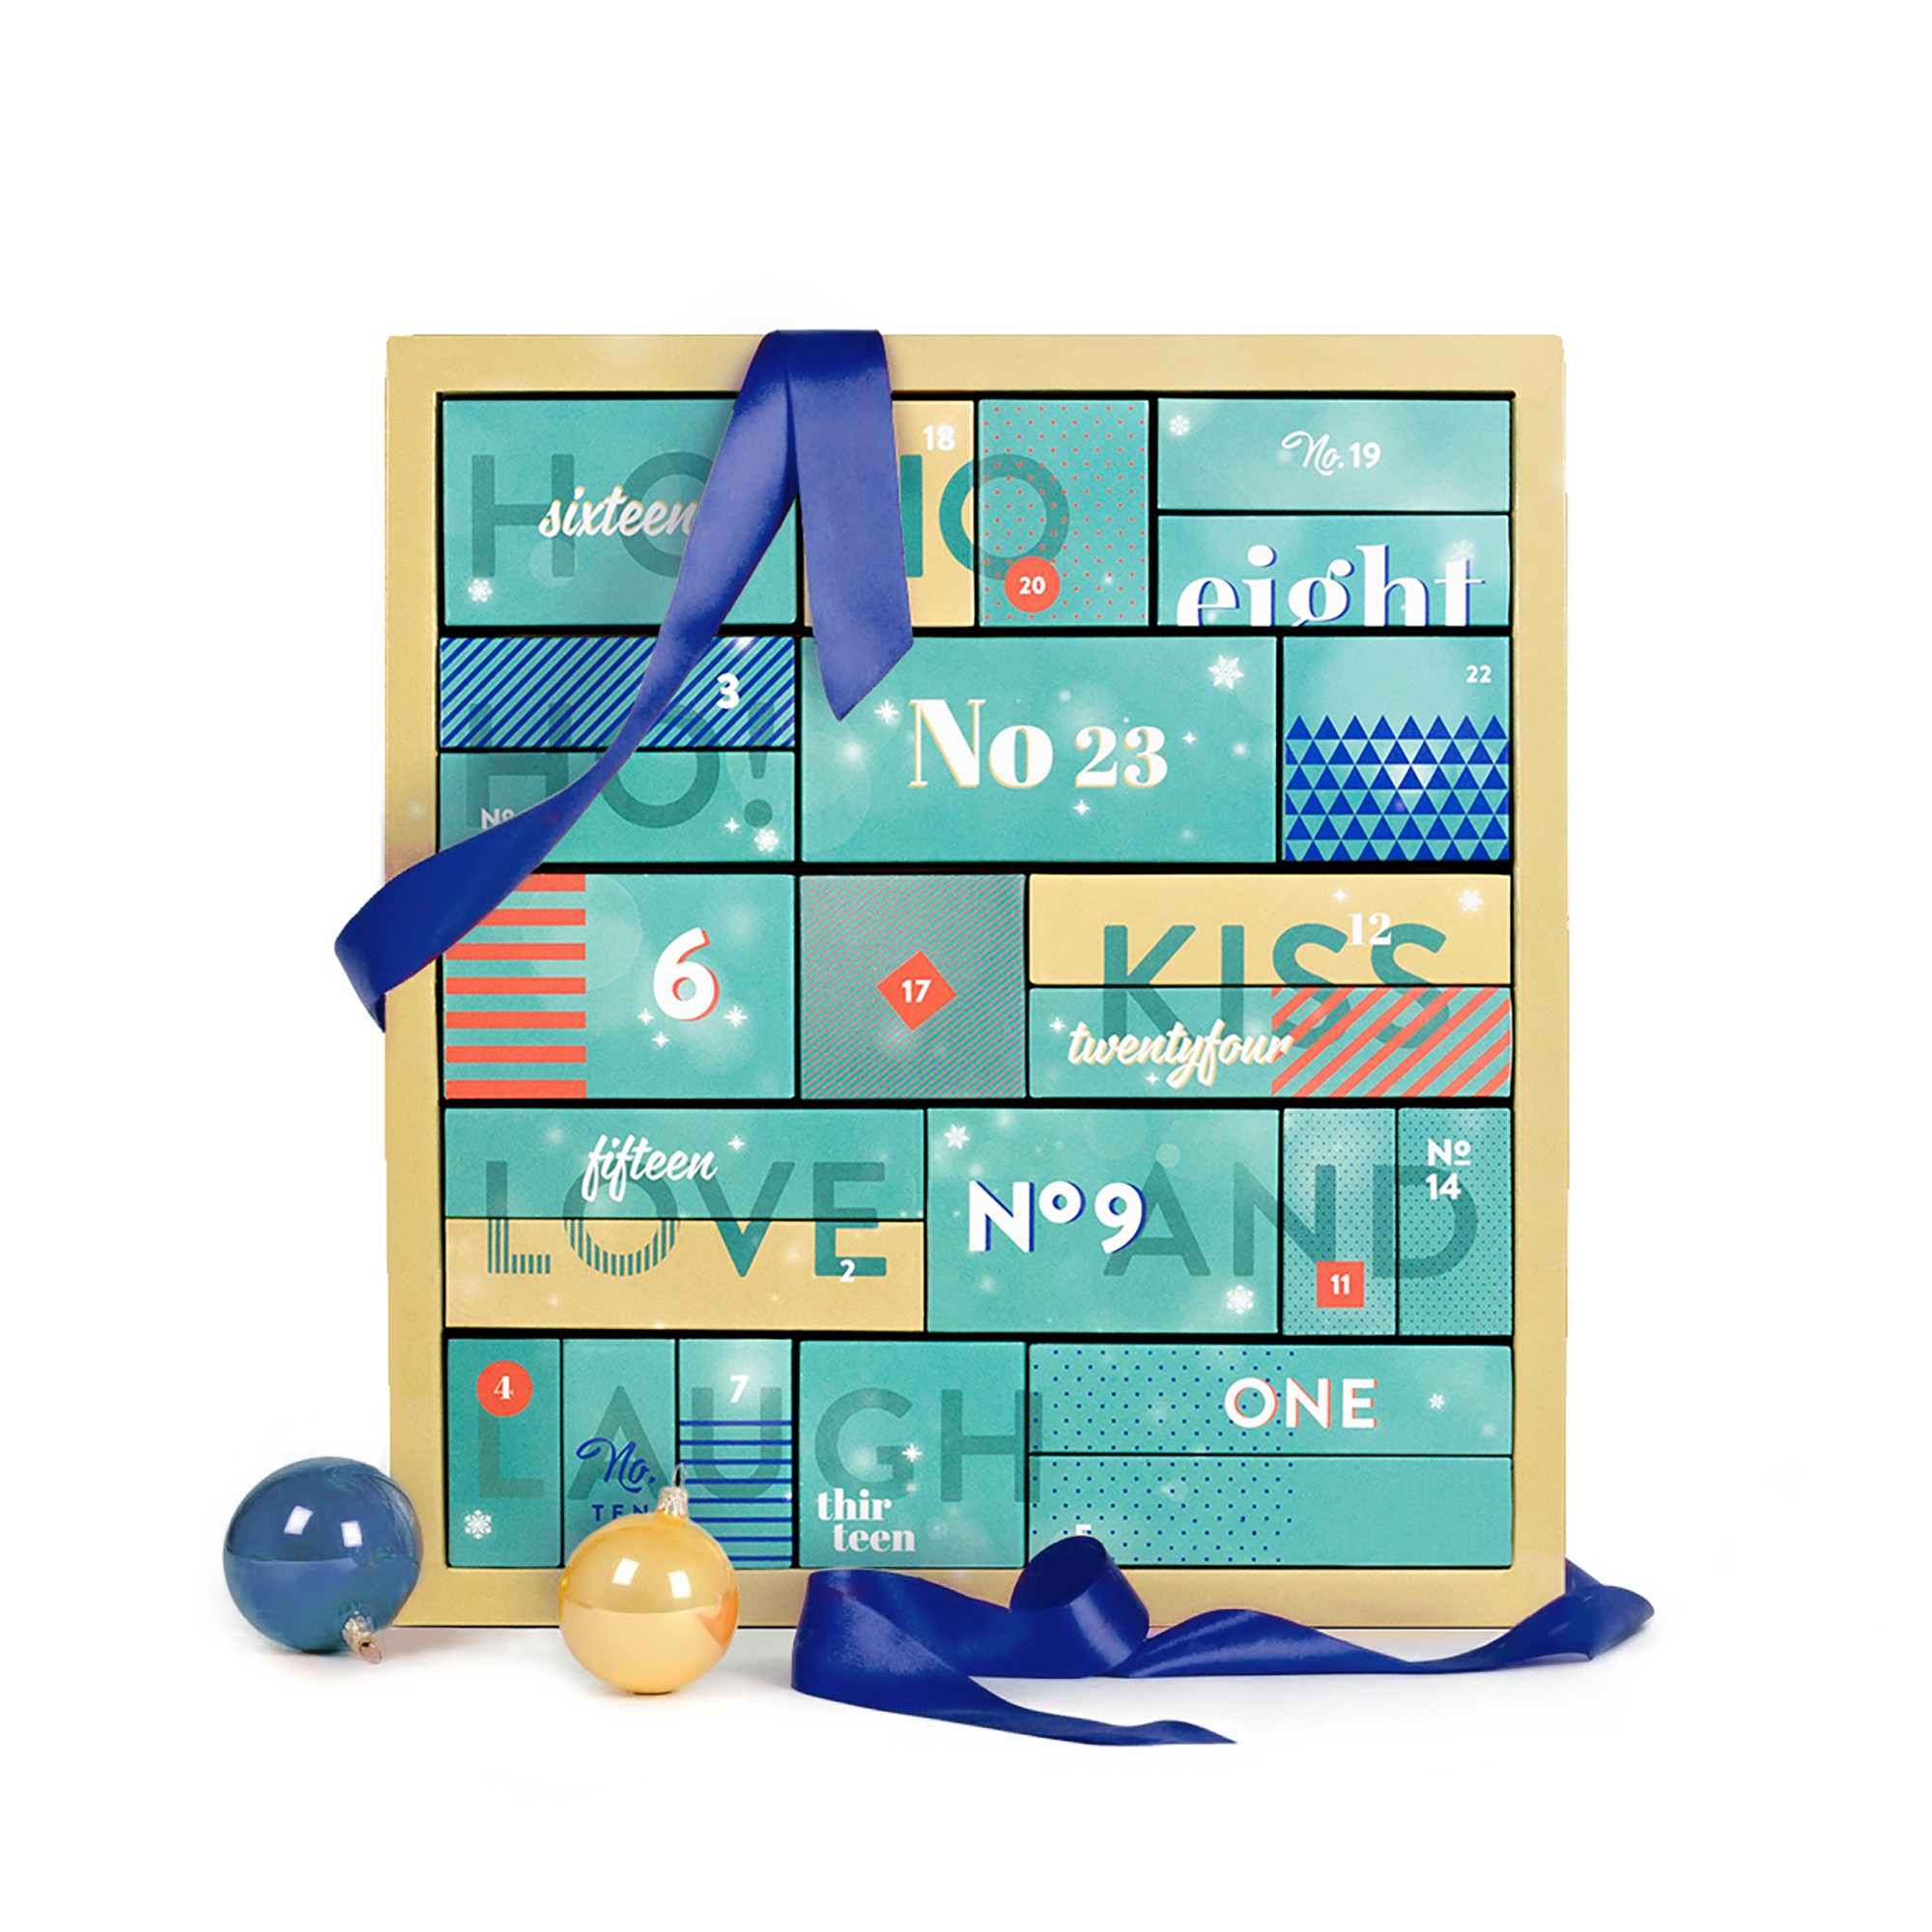 kw34_calendar-pic_1_adventskalender_